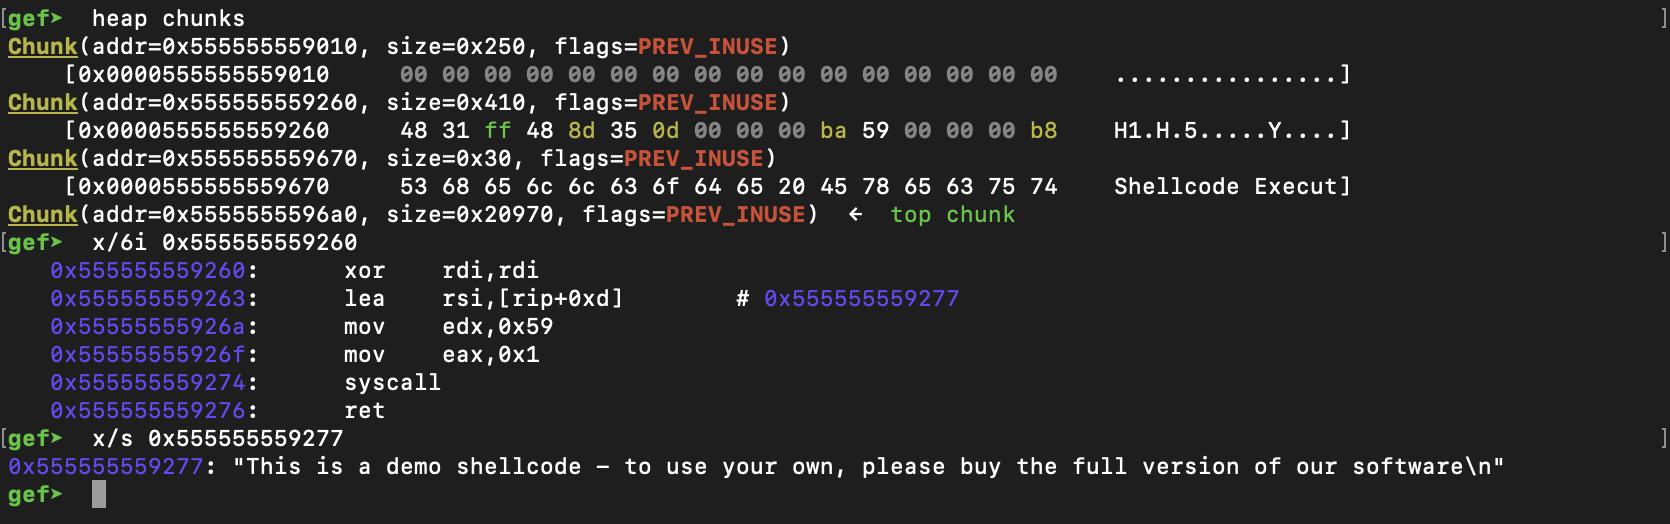 demo_shellcode